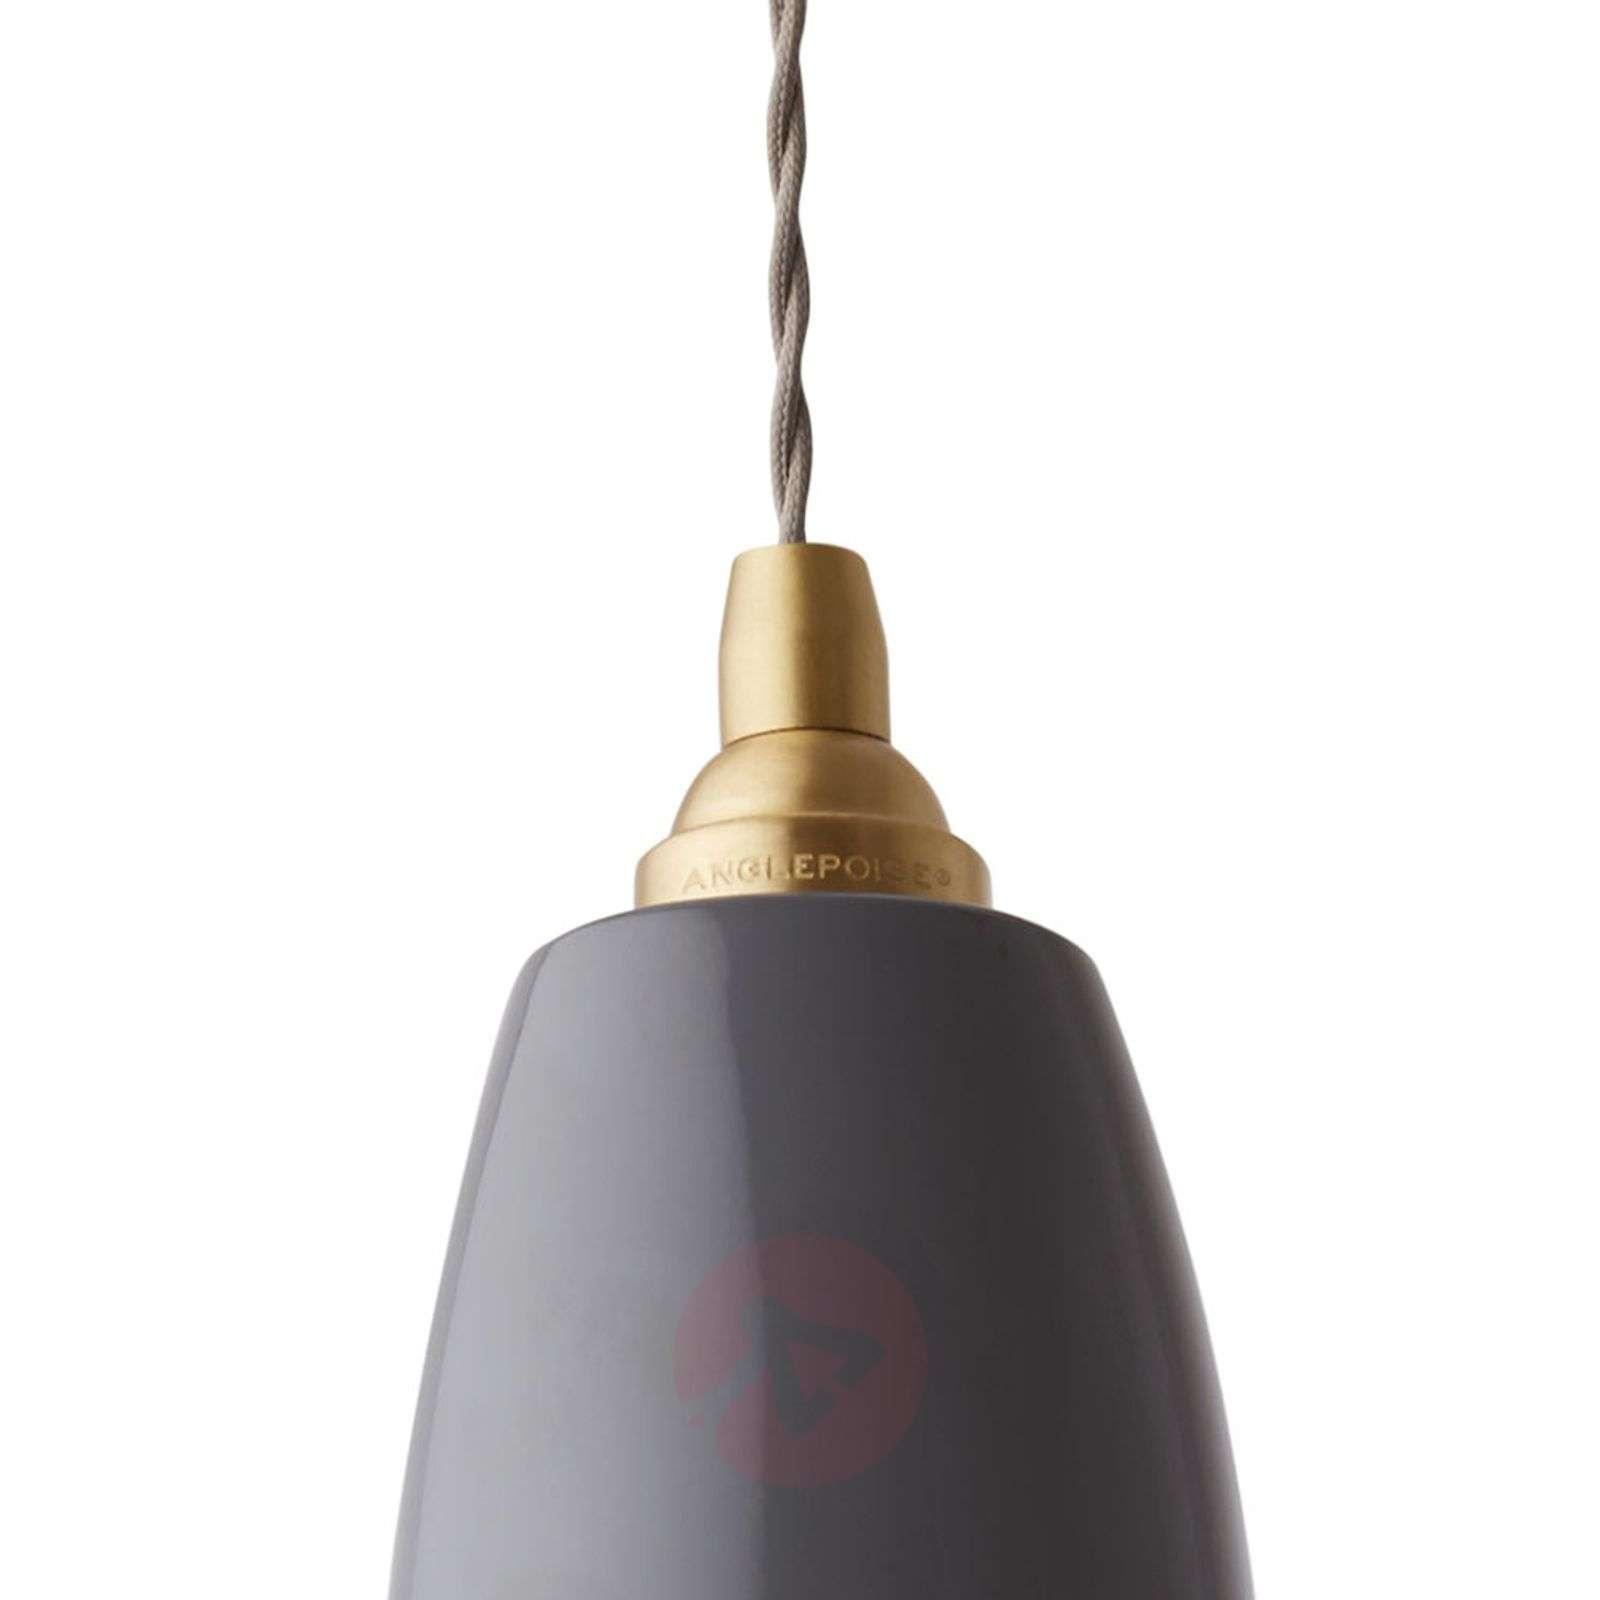 Anglepoise® Original 1227 brass hanging lamp-1073082X-012